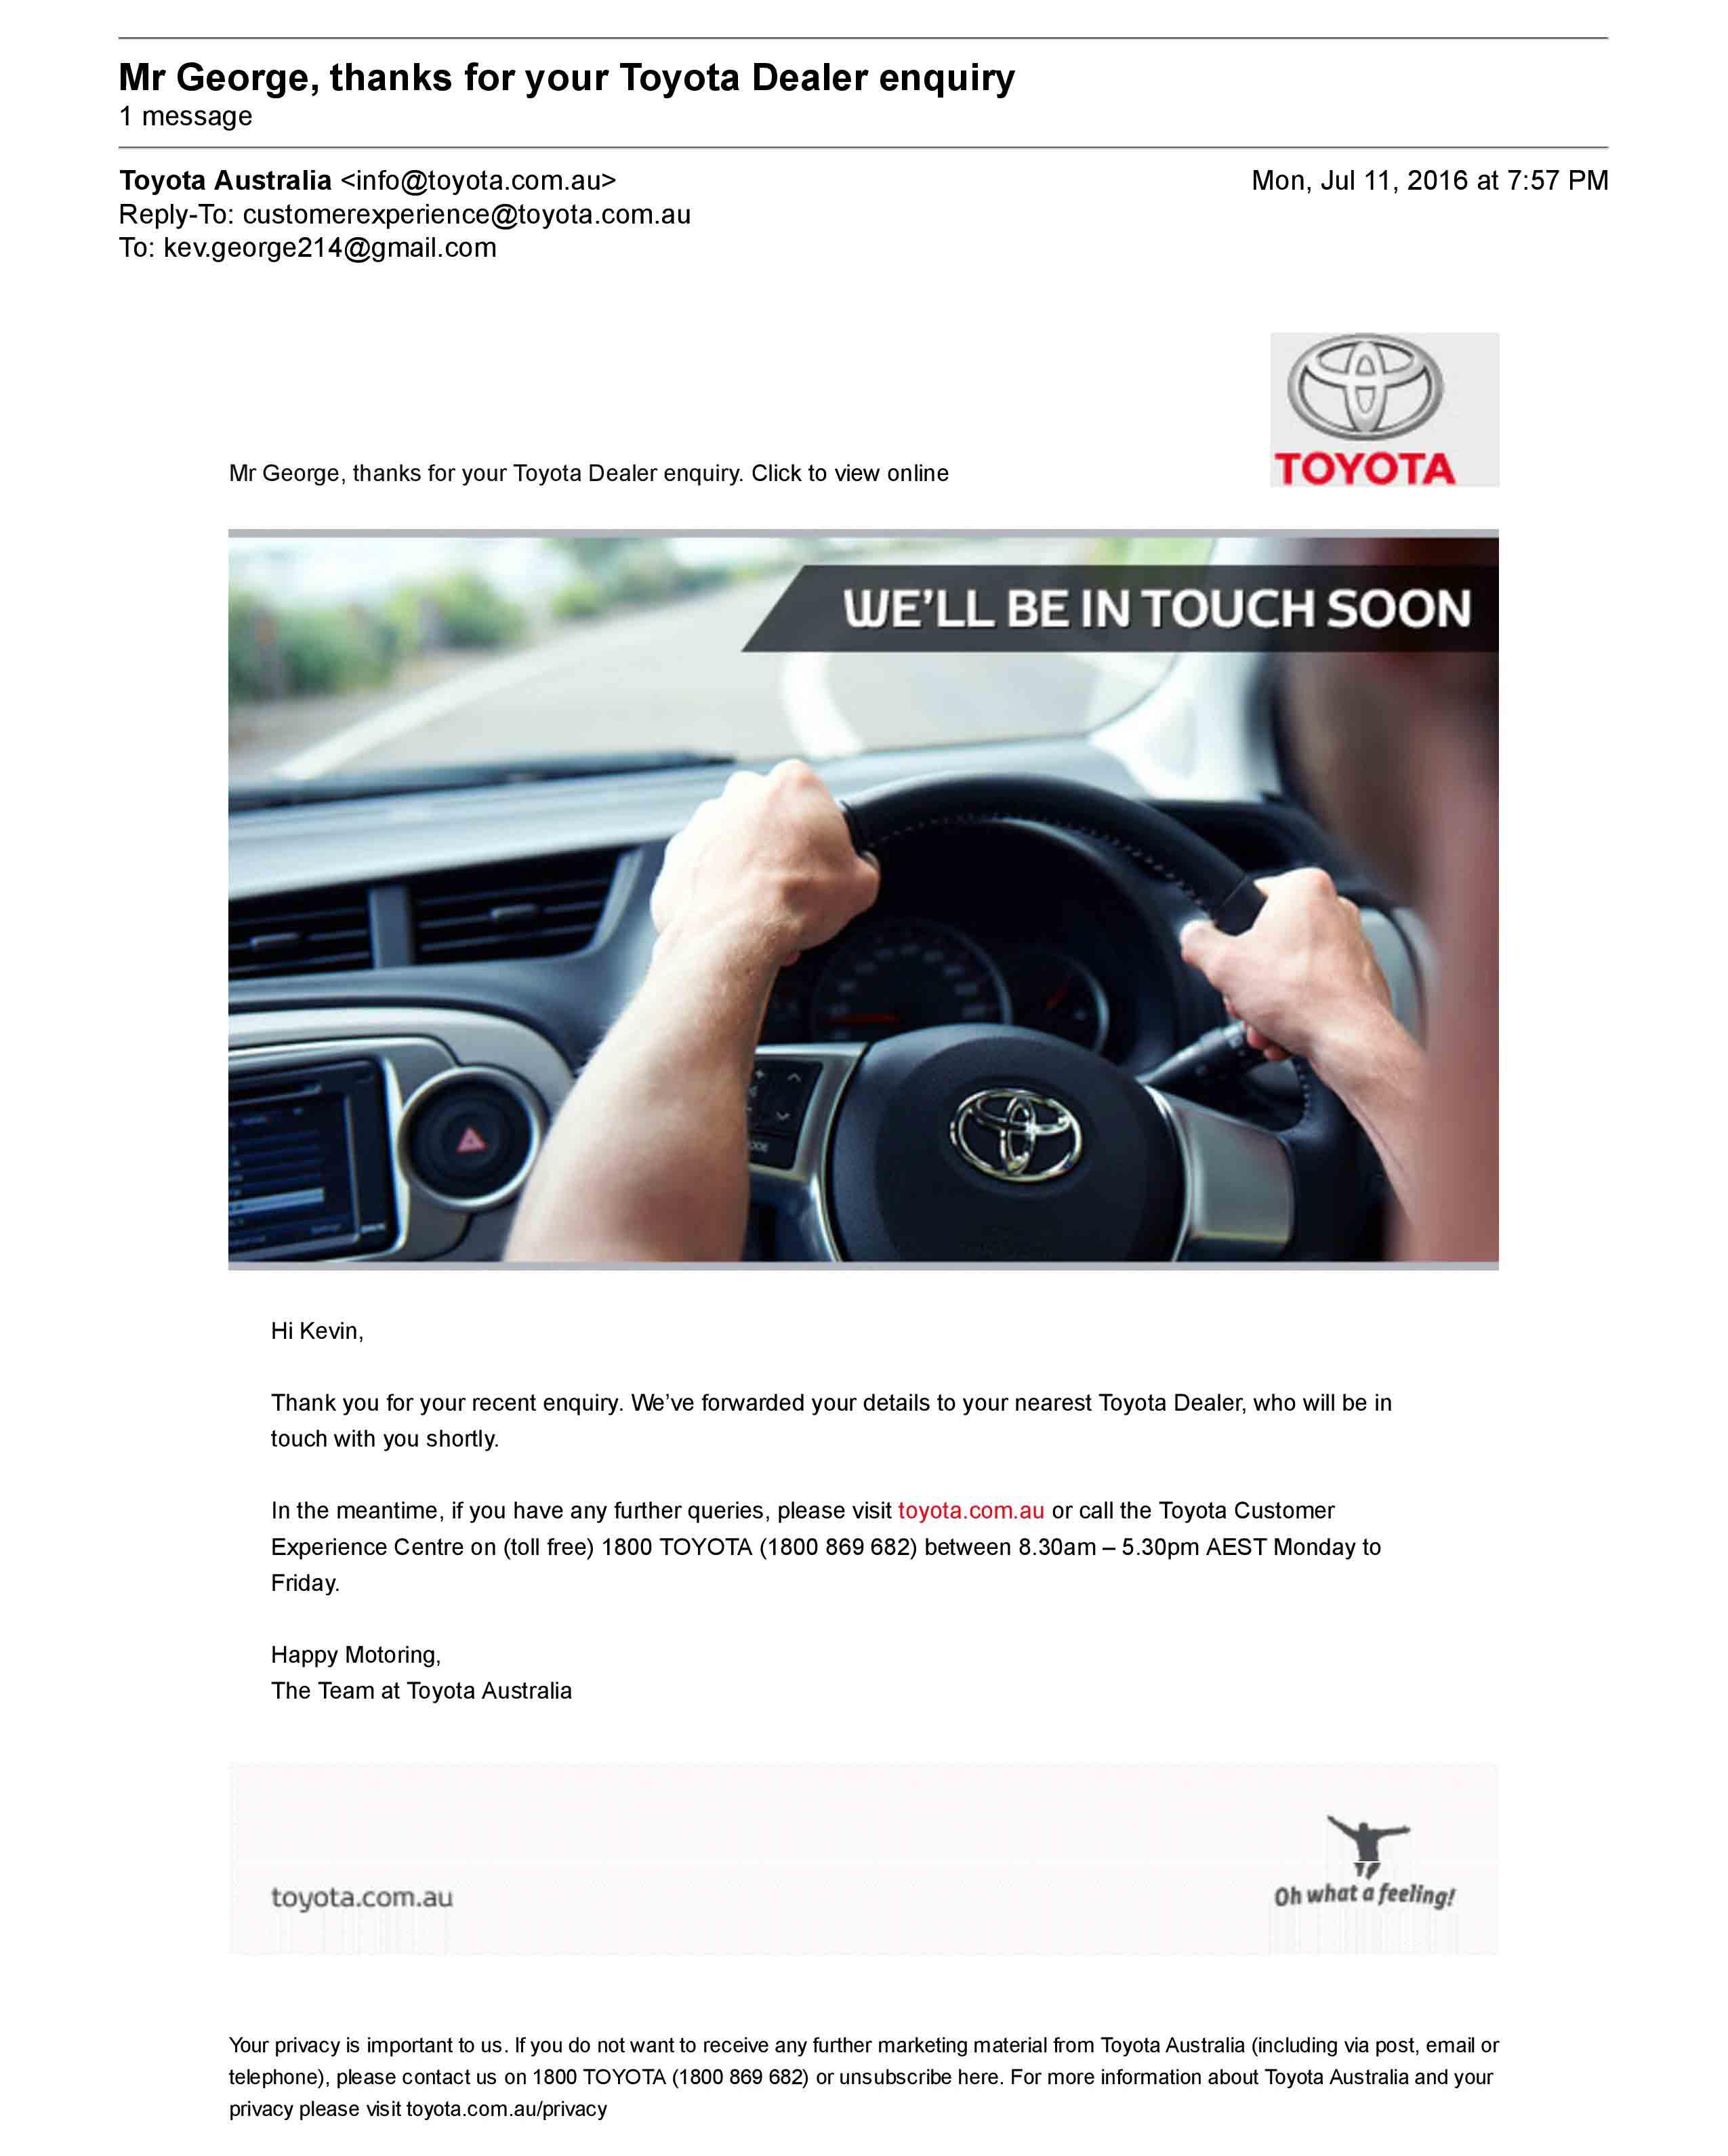 8 Performance-Efficient Automotive Email Design Examples